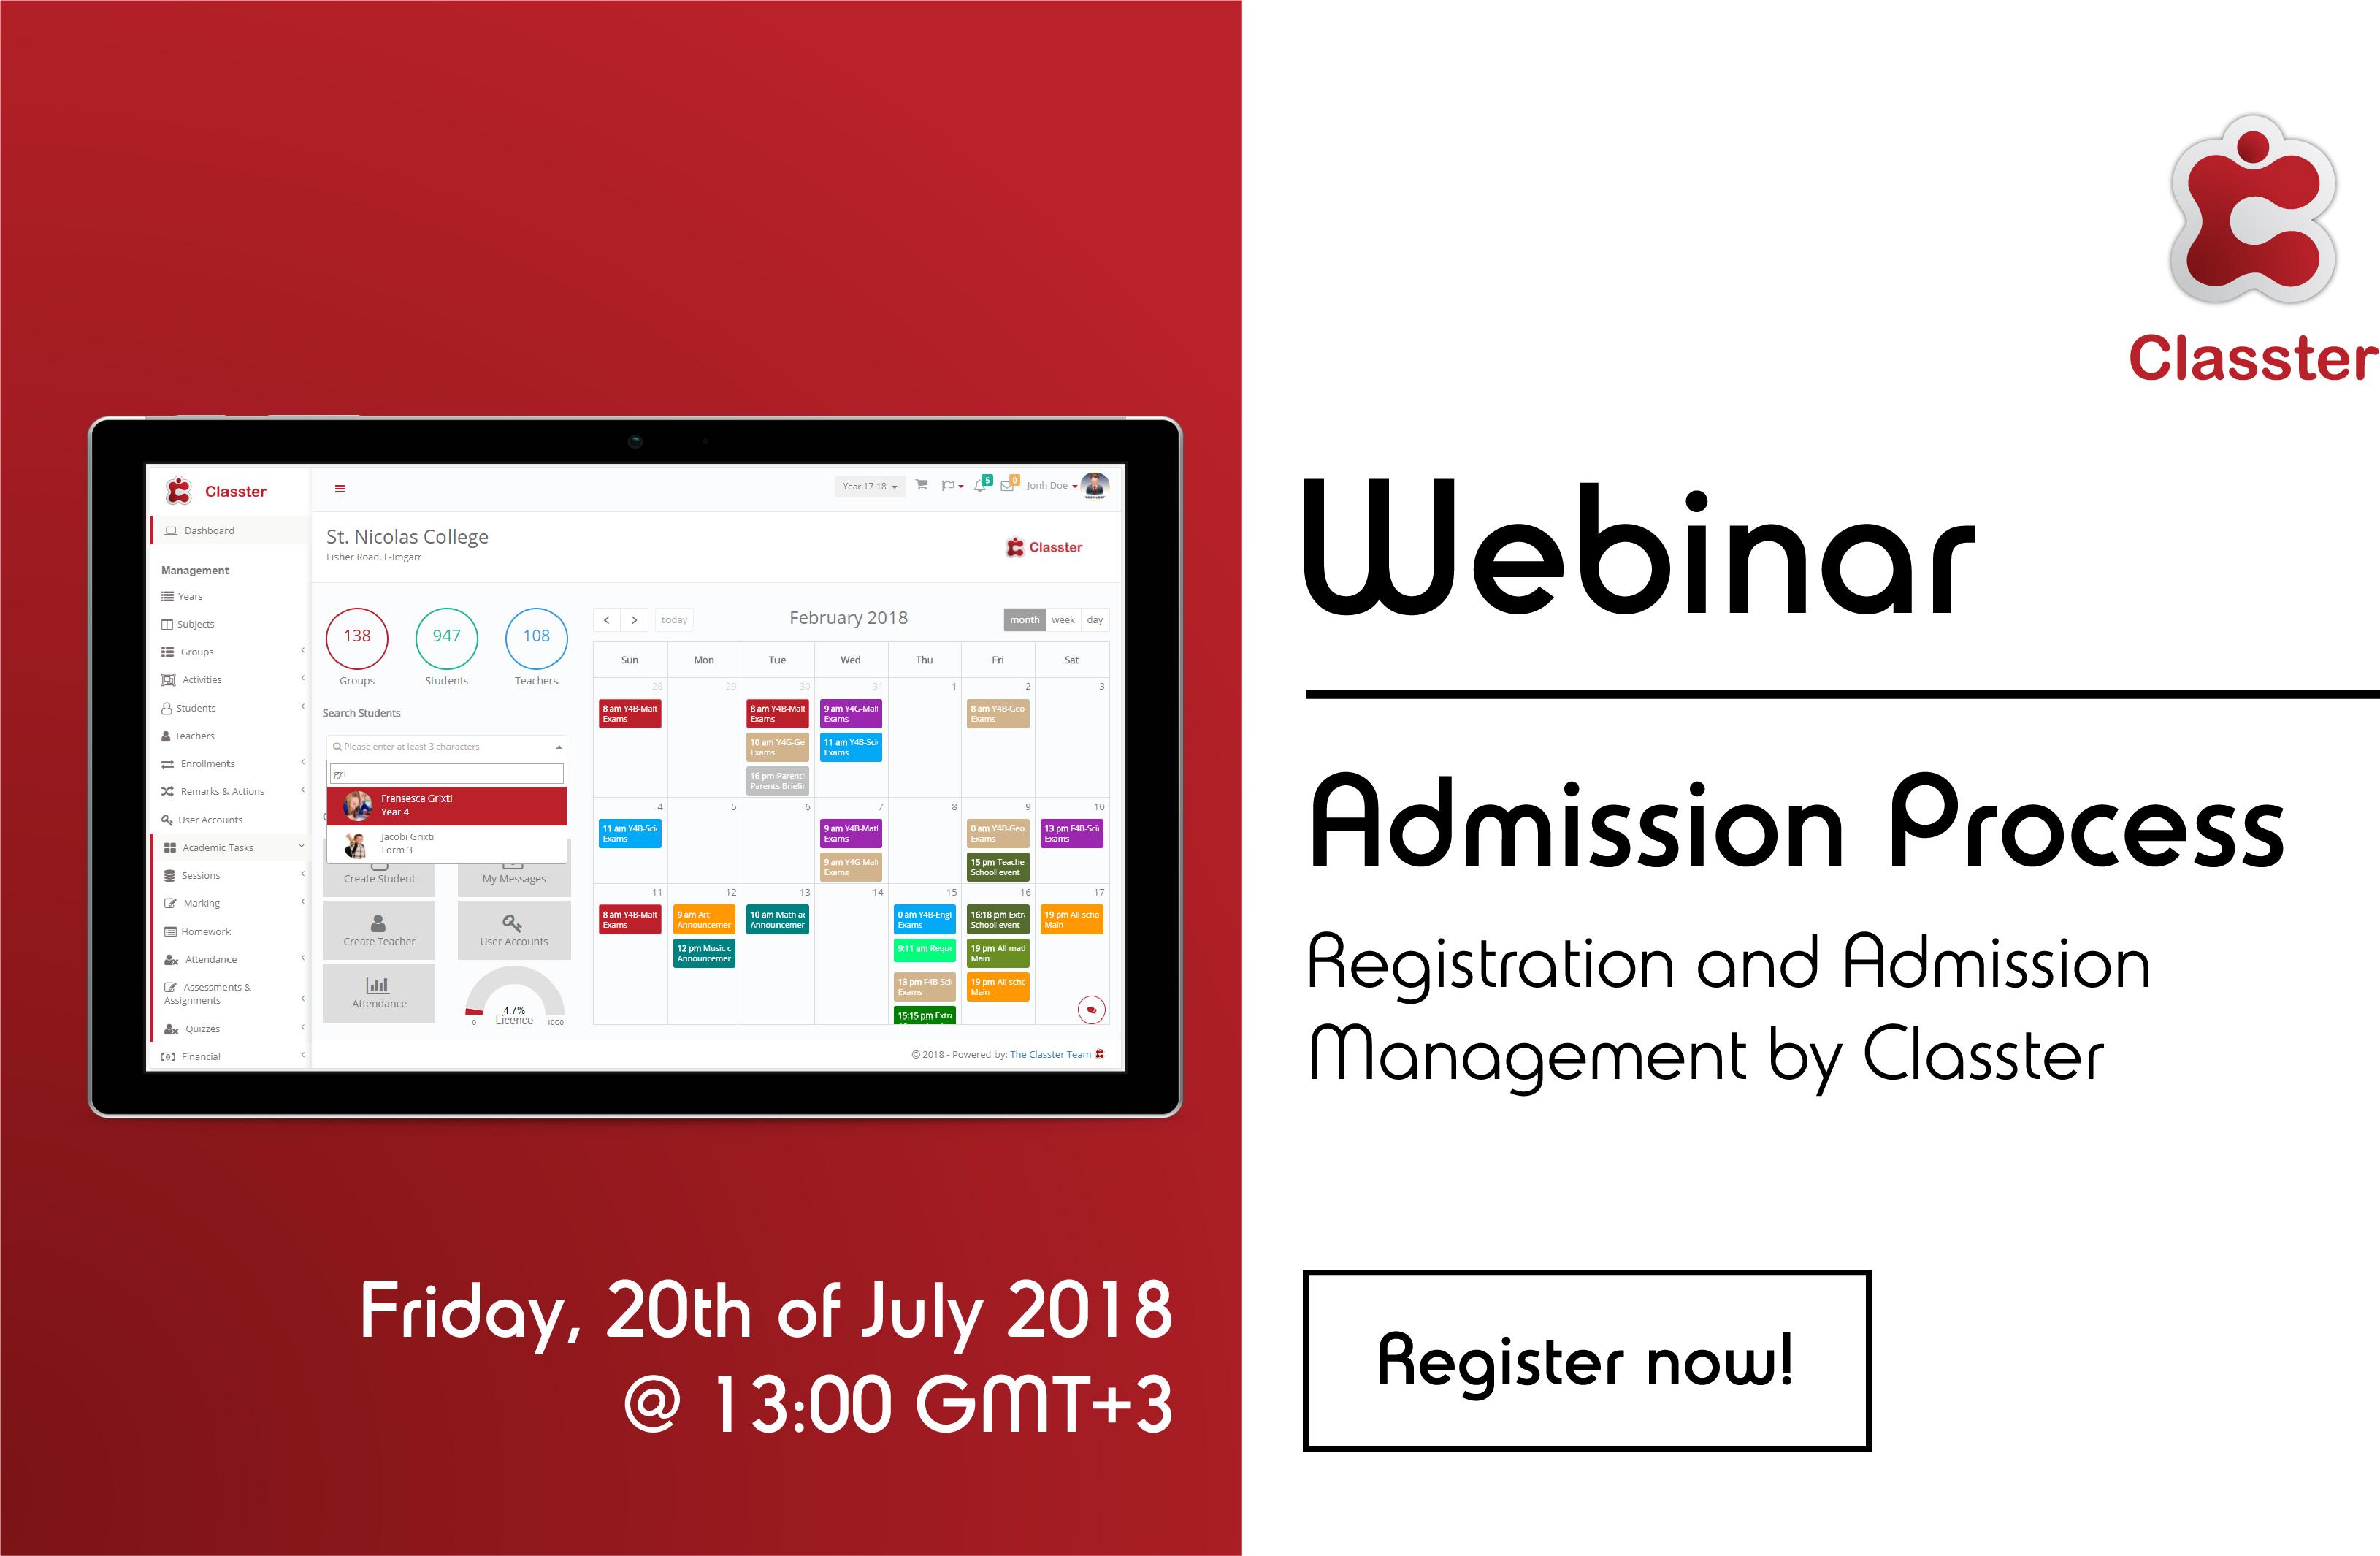 classter webinar admission process2